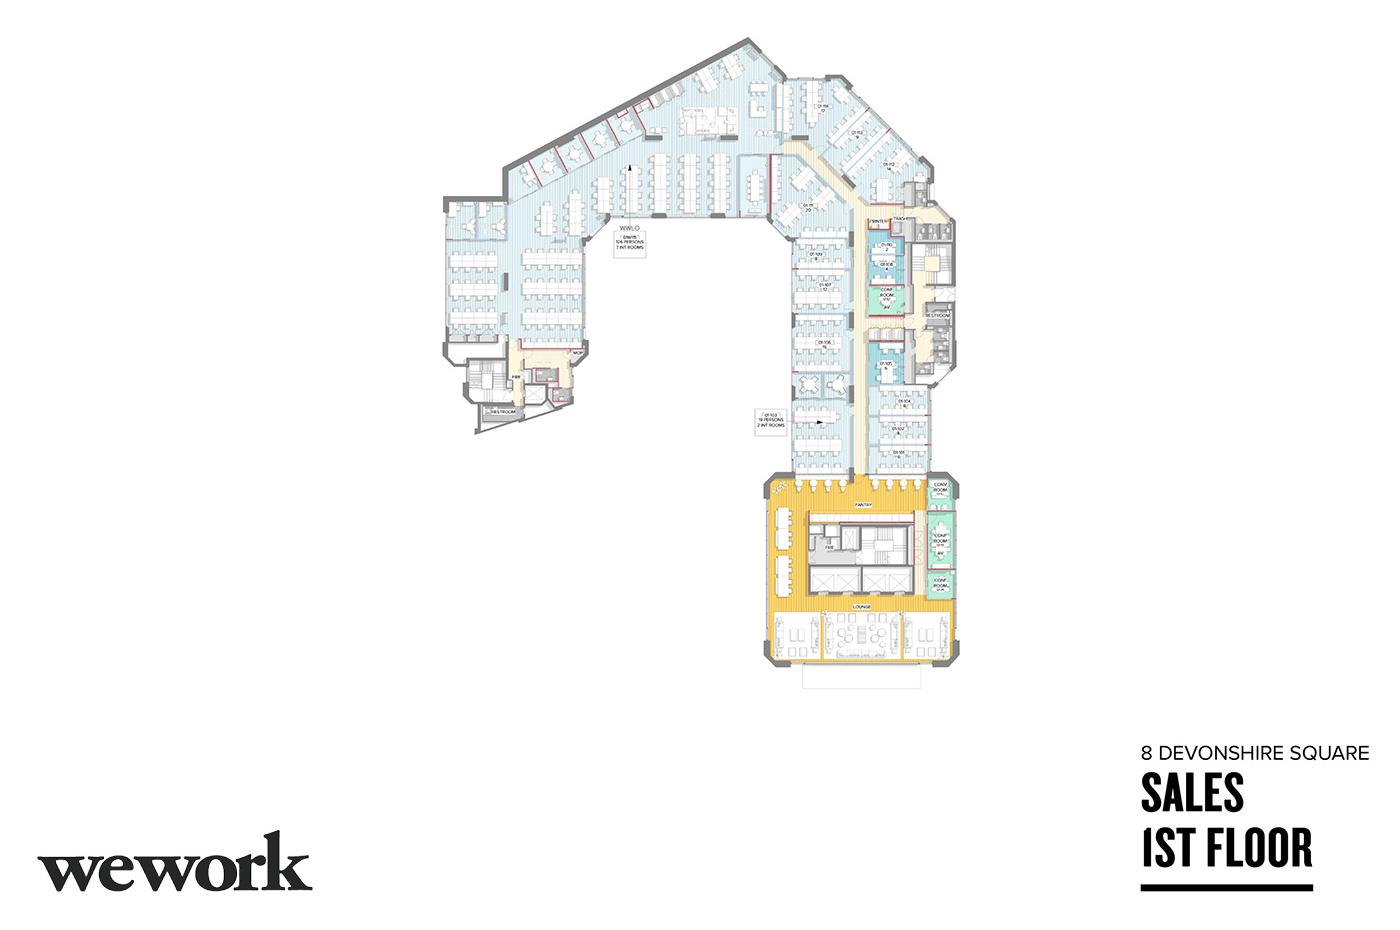 floorplans-2 copy.jpg